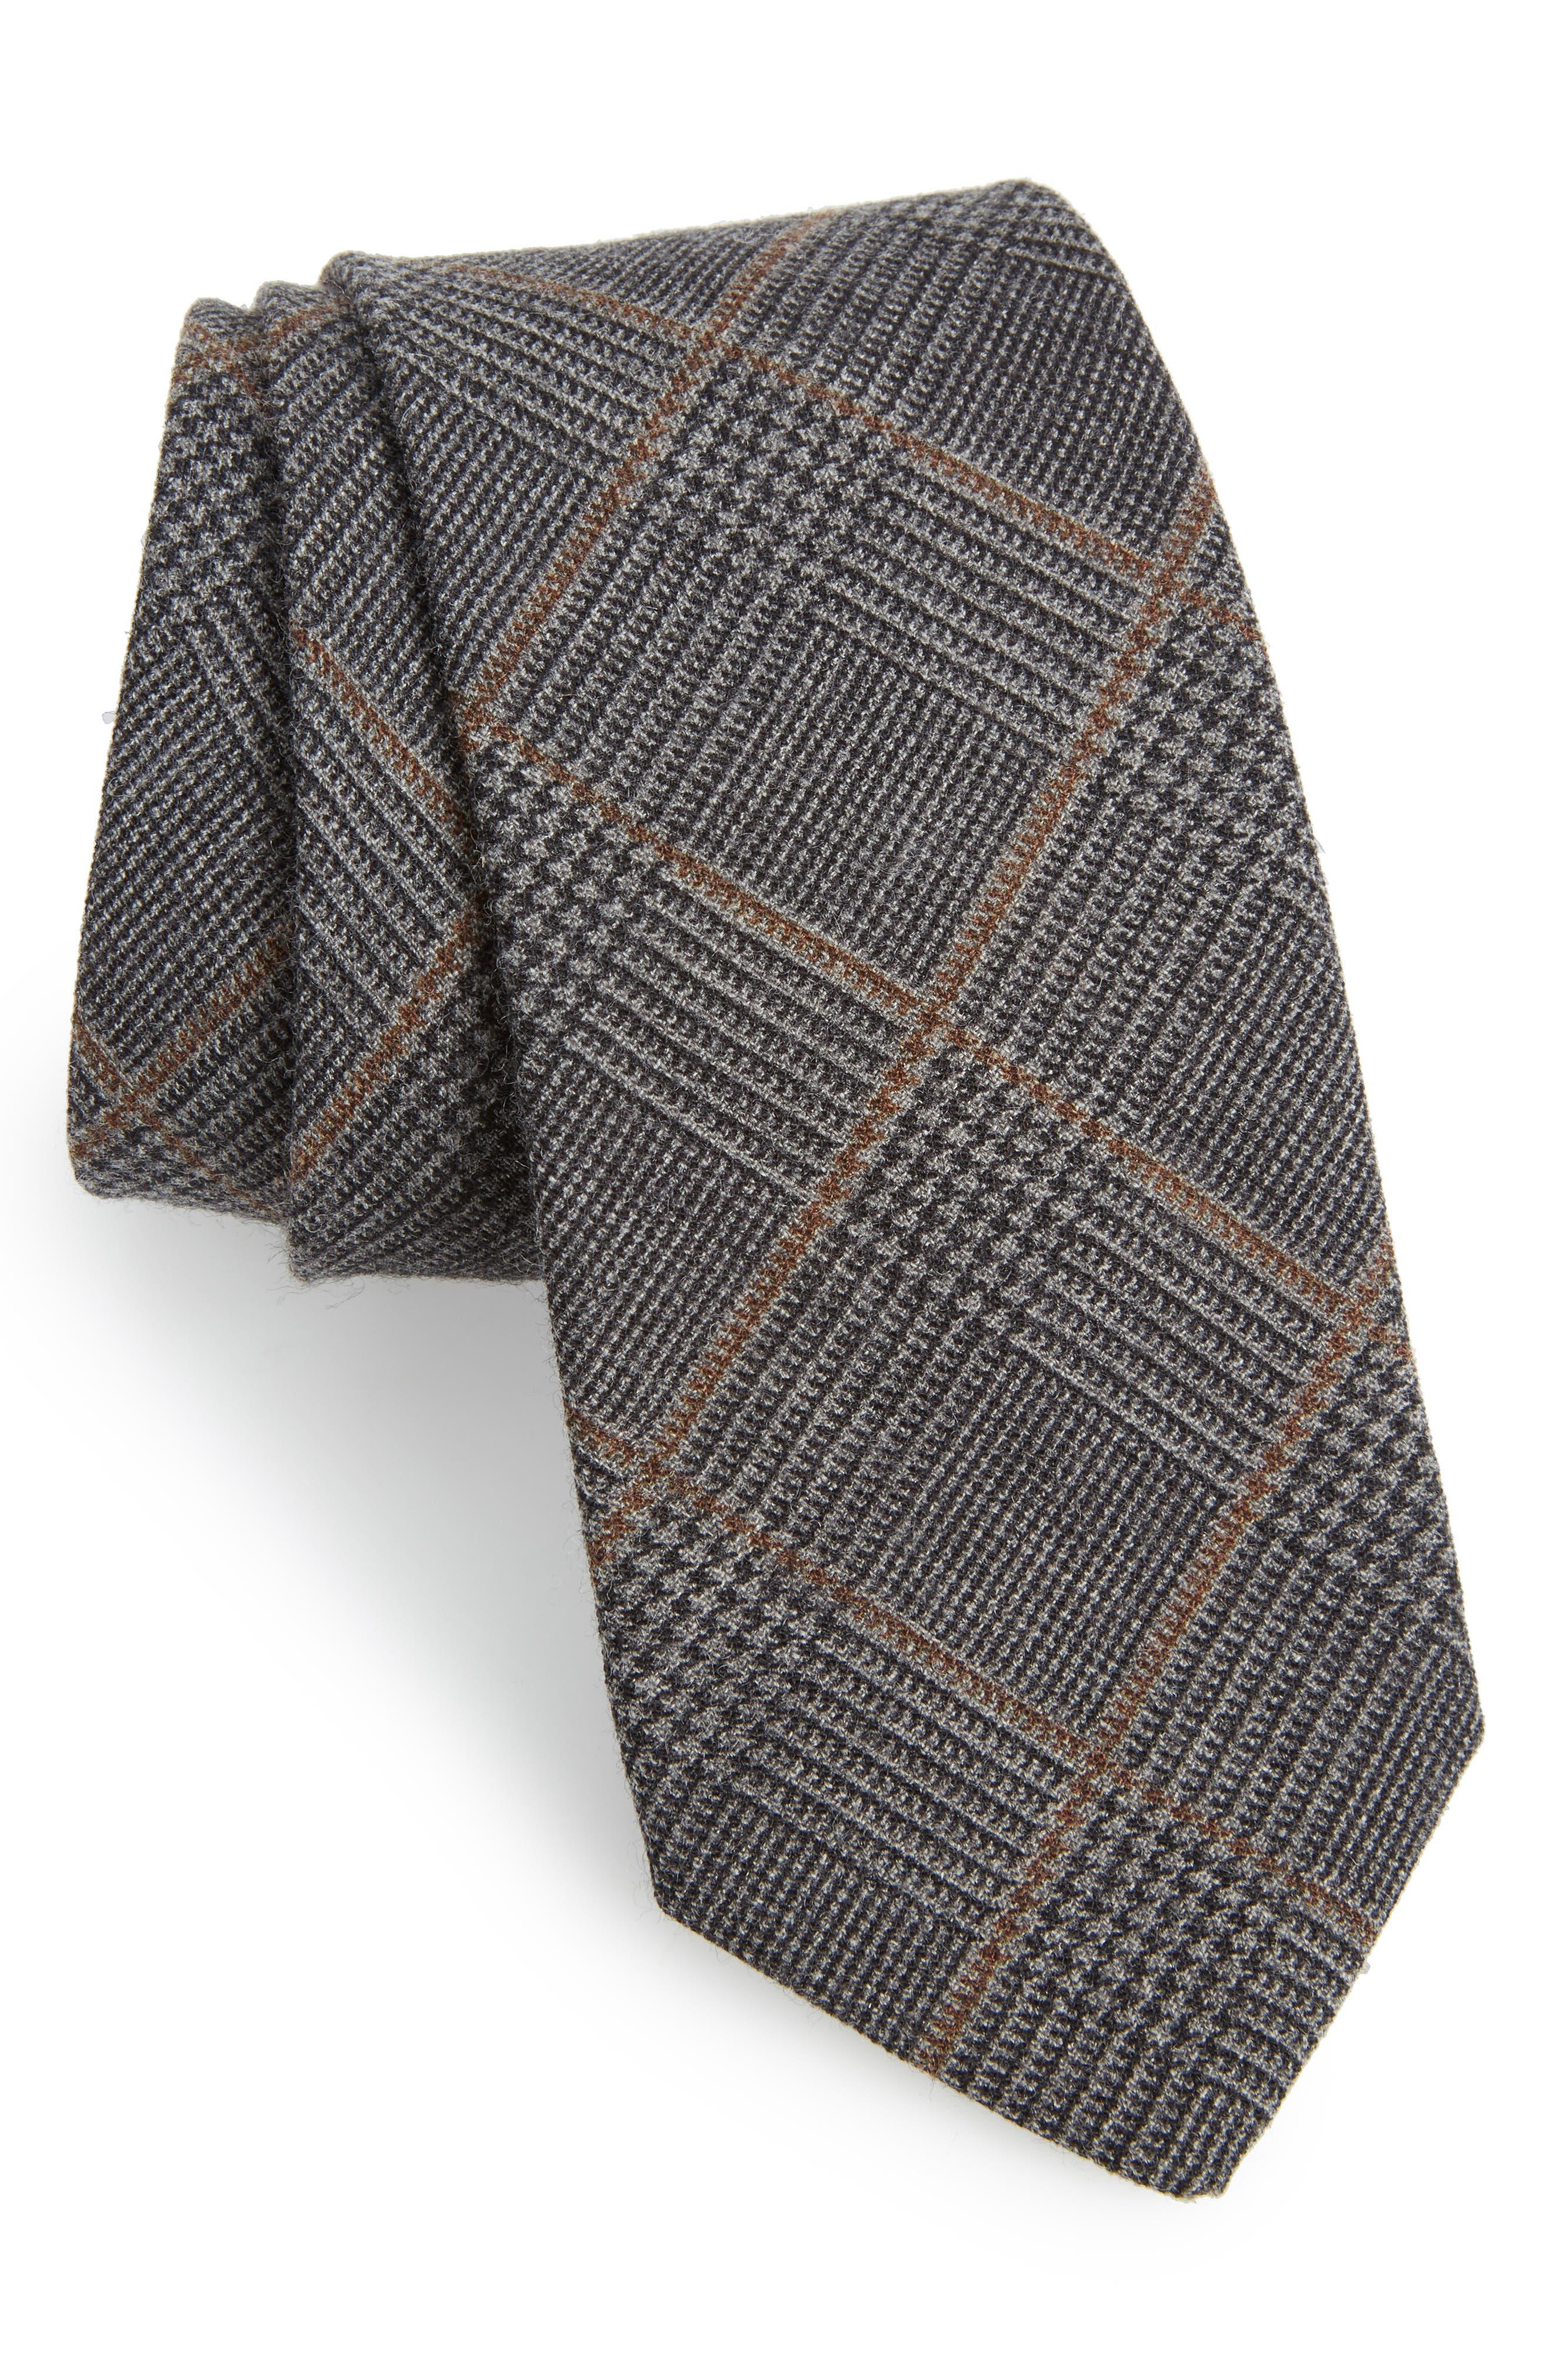 Dupont Glen Plaid Wool Tie,                             Main thumbnail 1, color,                             400